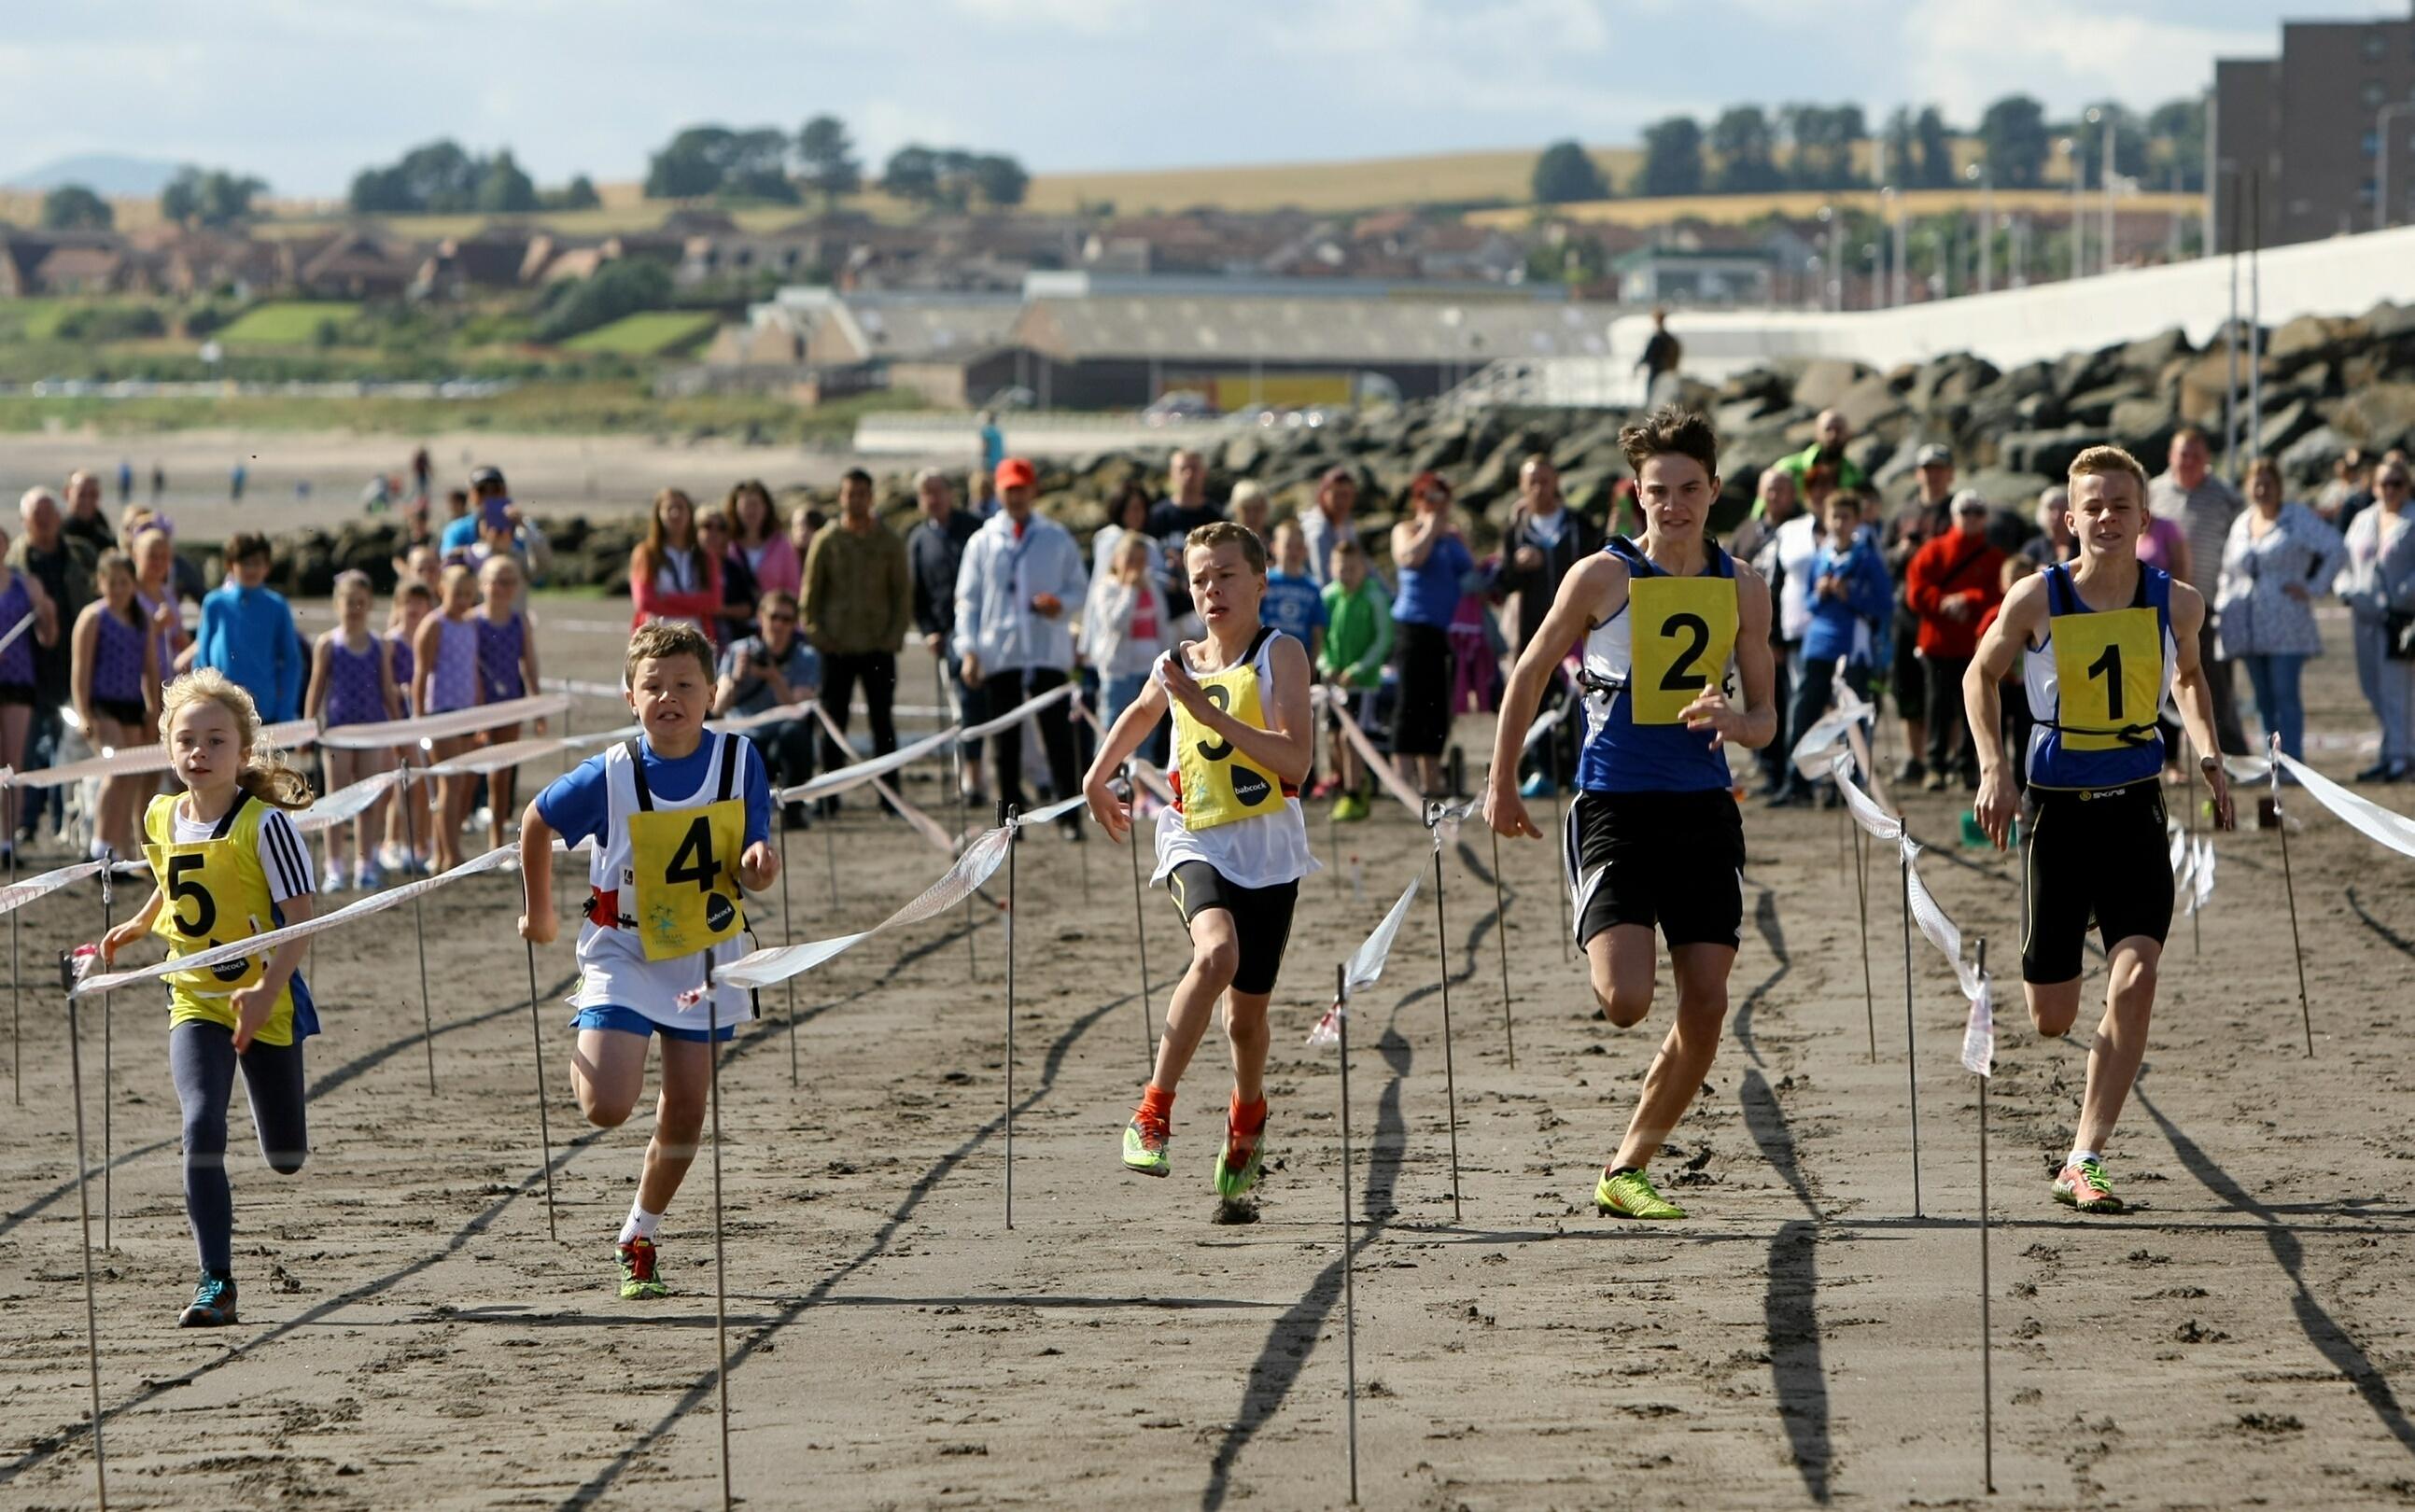 Kirkcaldy Beach Highland Games in 2015.